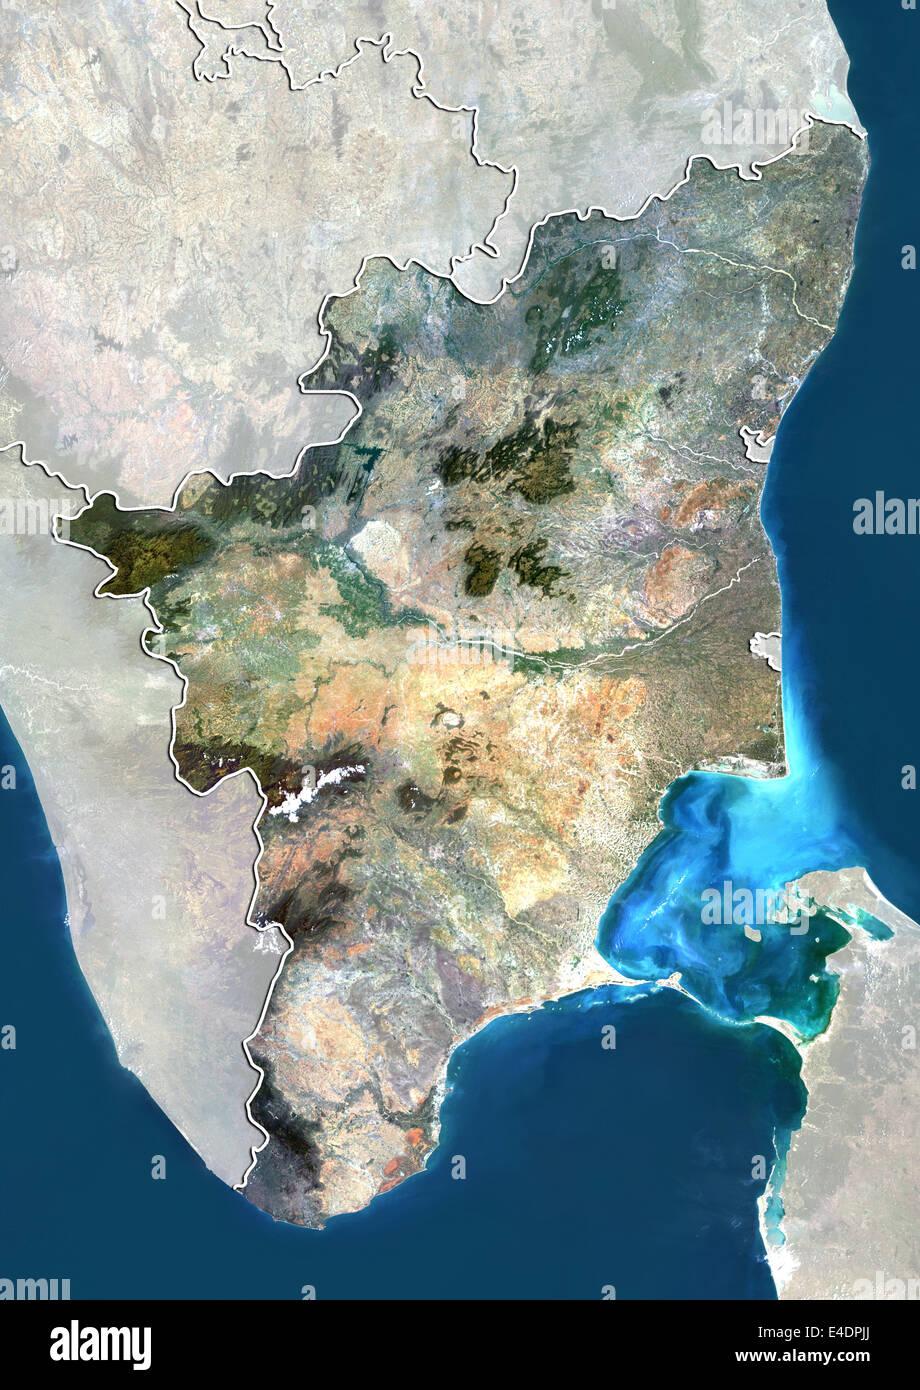 Tamilnadu Satellite Map State of Tamil Nadu, India, True Colour Satellite Image Stock  Tamilnadu Satellite Map